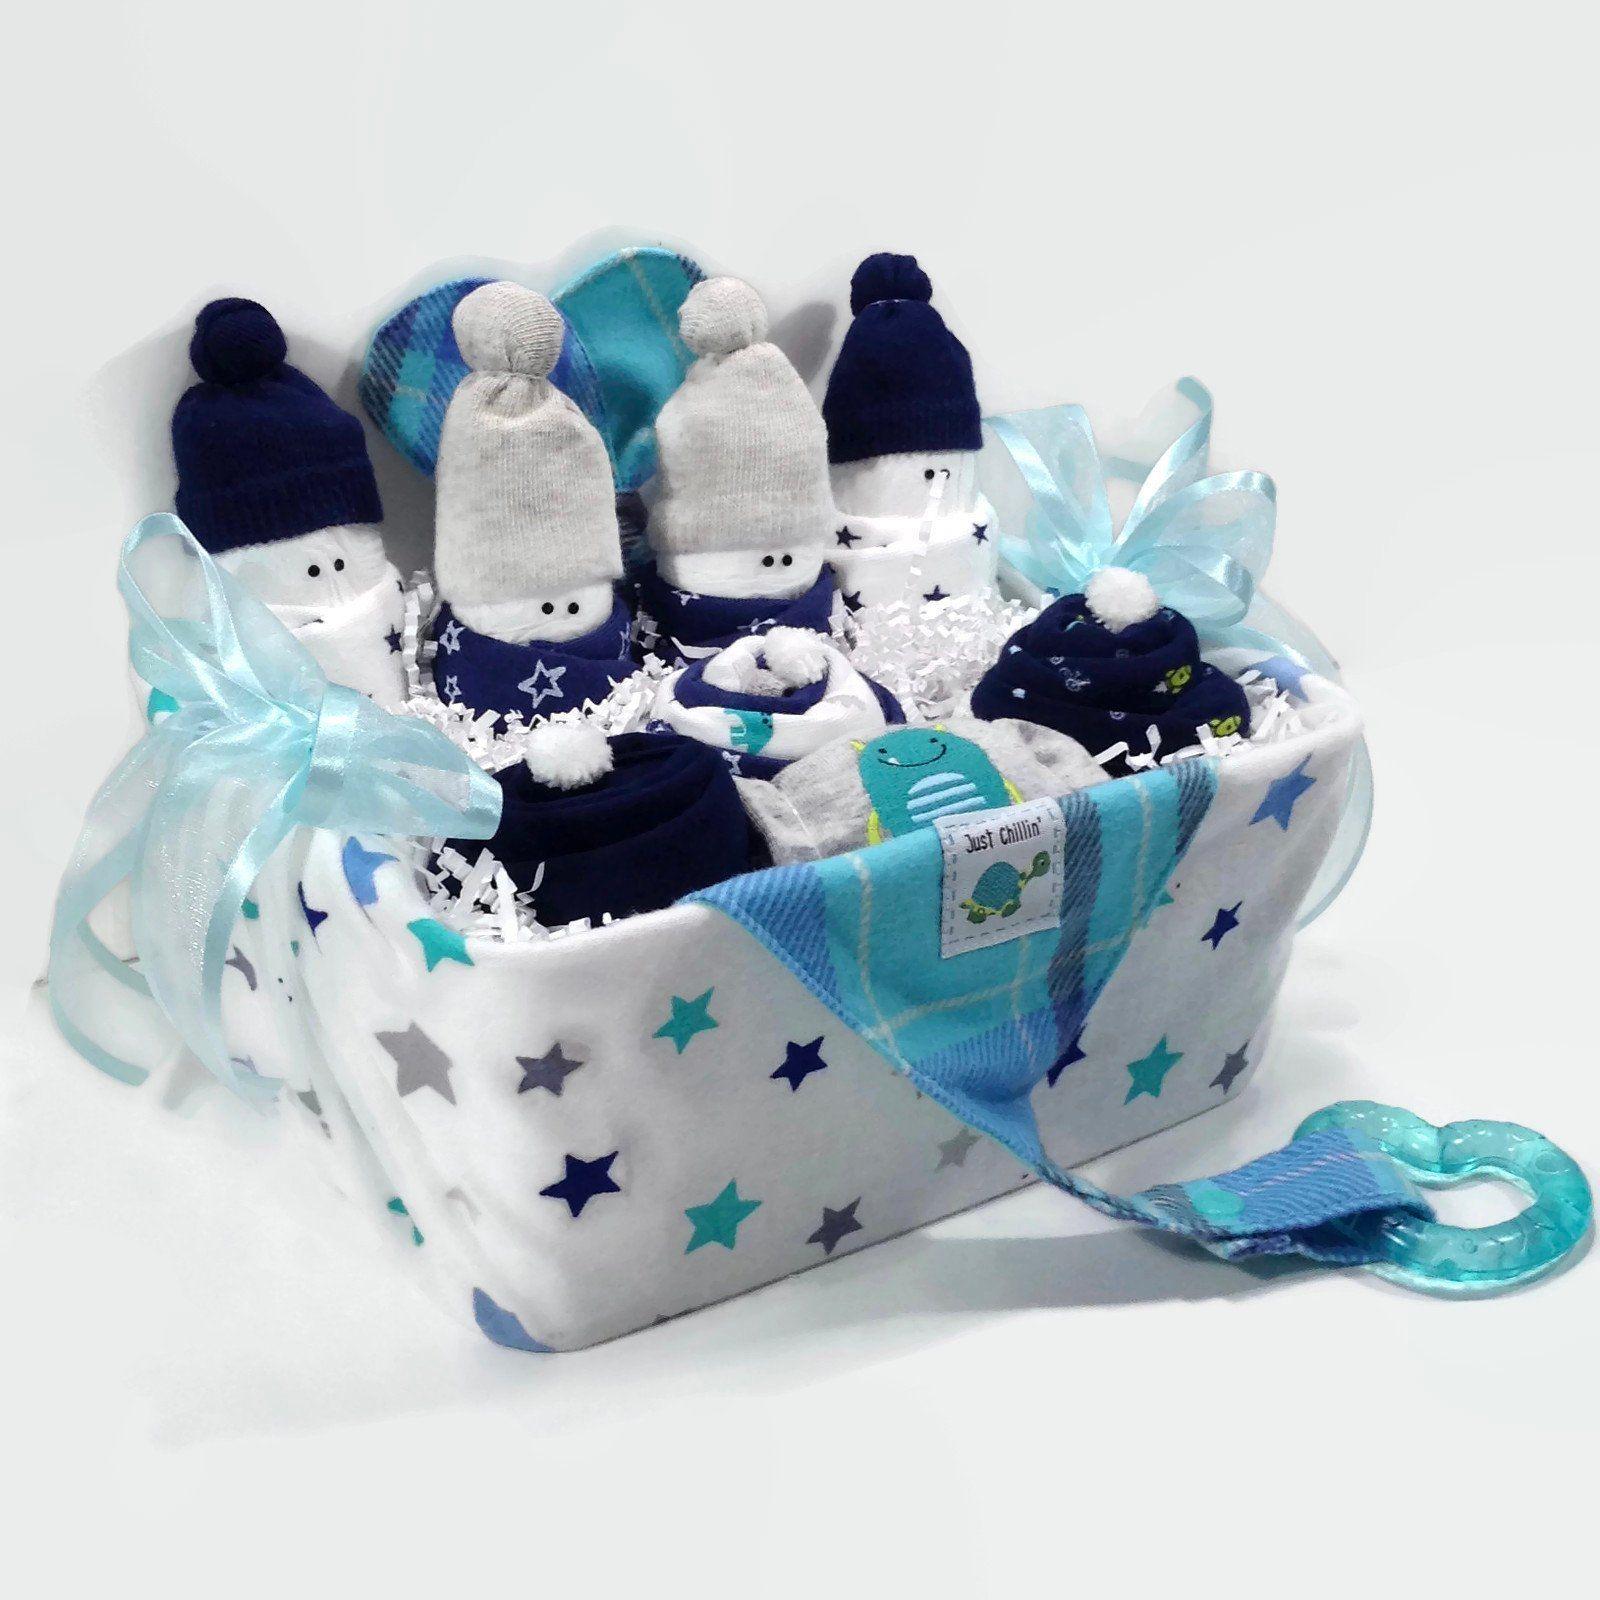 Baby Boy Gift Basket New Mom Gift Basket Baby Shower Gift Best Baby Gift Baby Boy Gift Baby Boy Gift Baskets Baby Boy Gifts New Mom Gift Basket